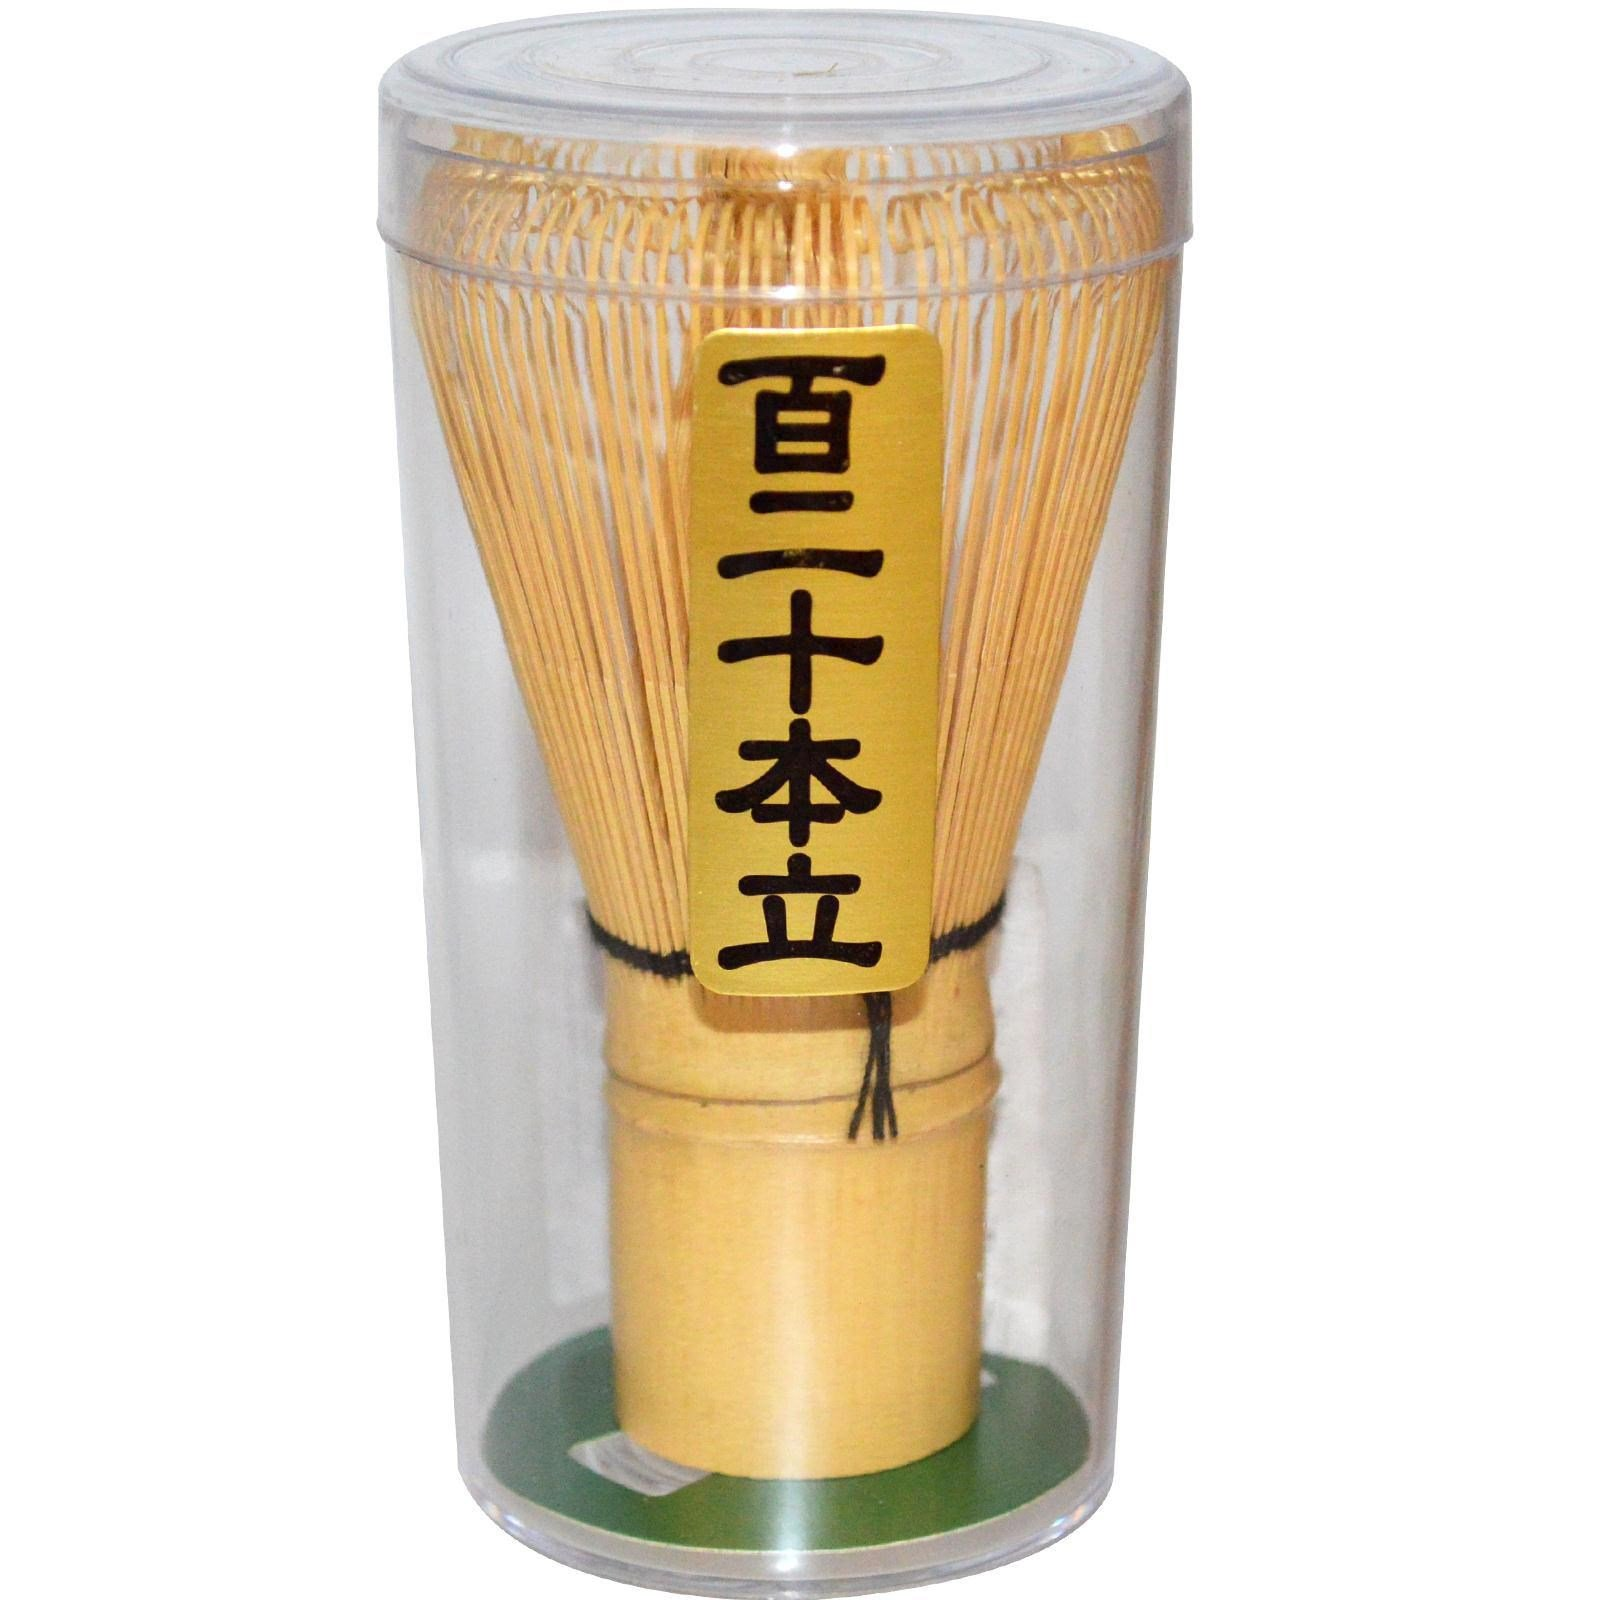 JapanBargain S-3679, Bamboo Matcha Tea Whisk Chasen, 120 Prong by JapanBargain (Image #1)